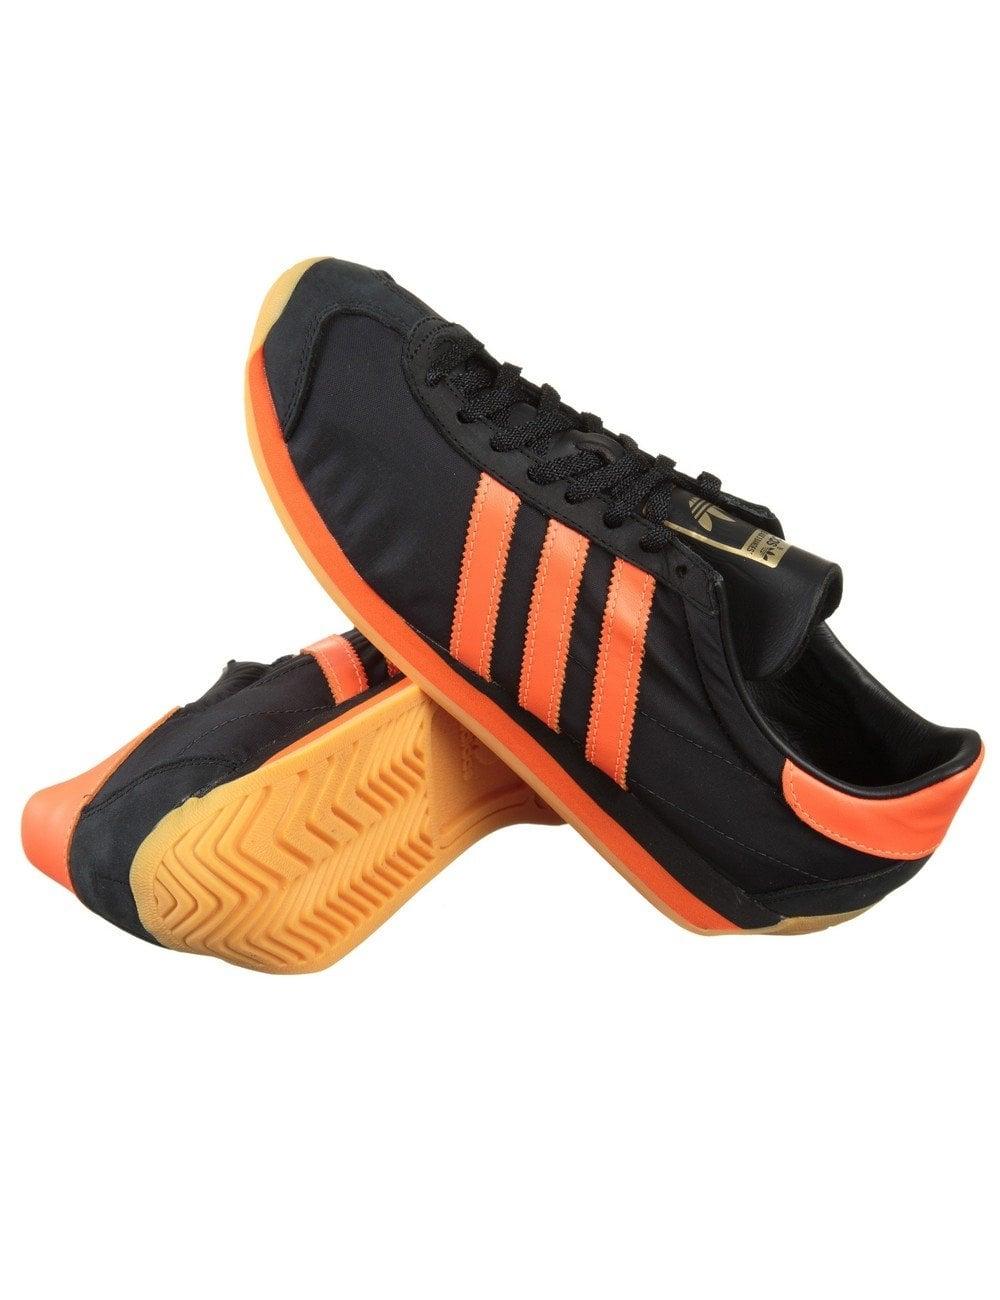 Adidas Originals Country og zapatos Core Negro / naranja Solar